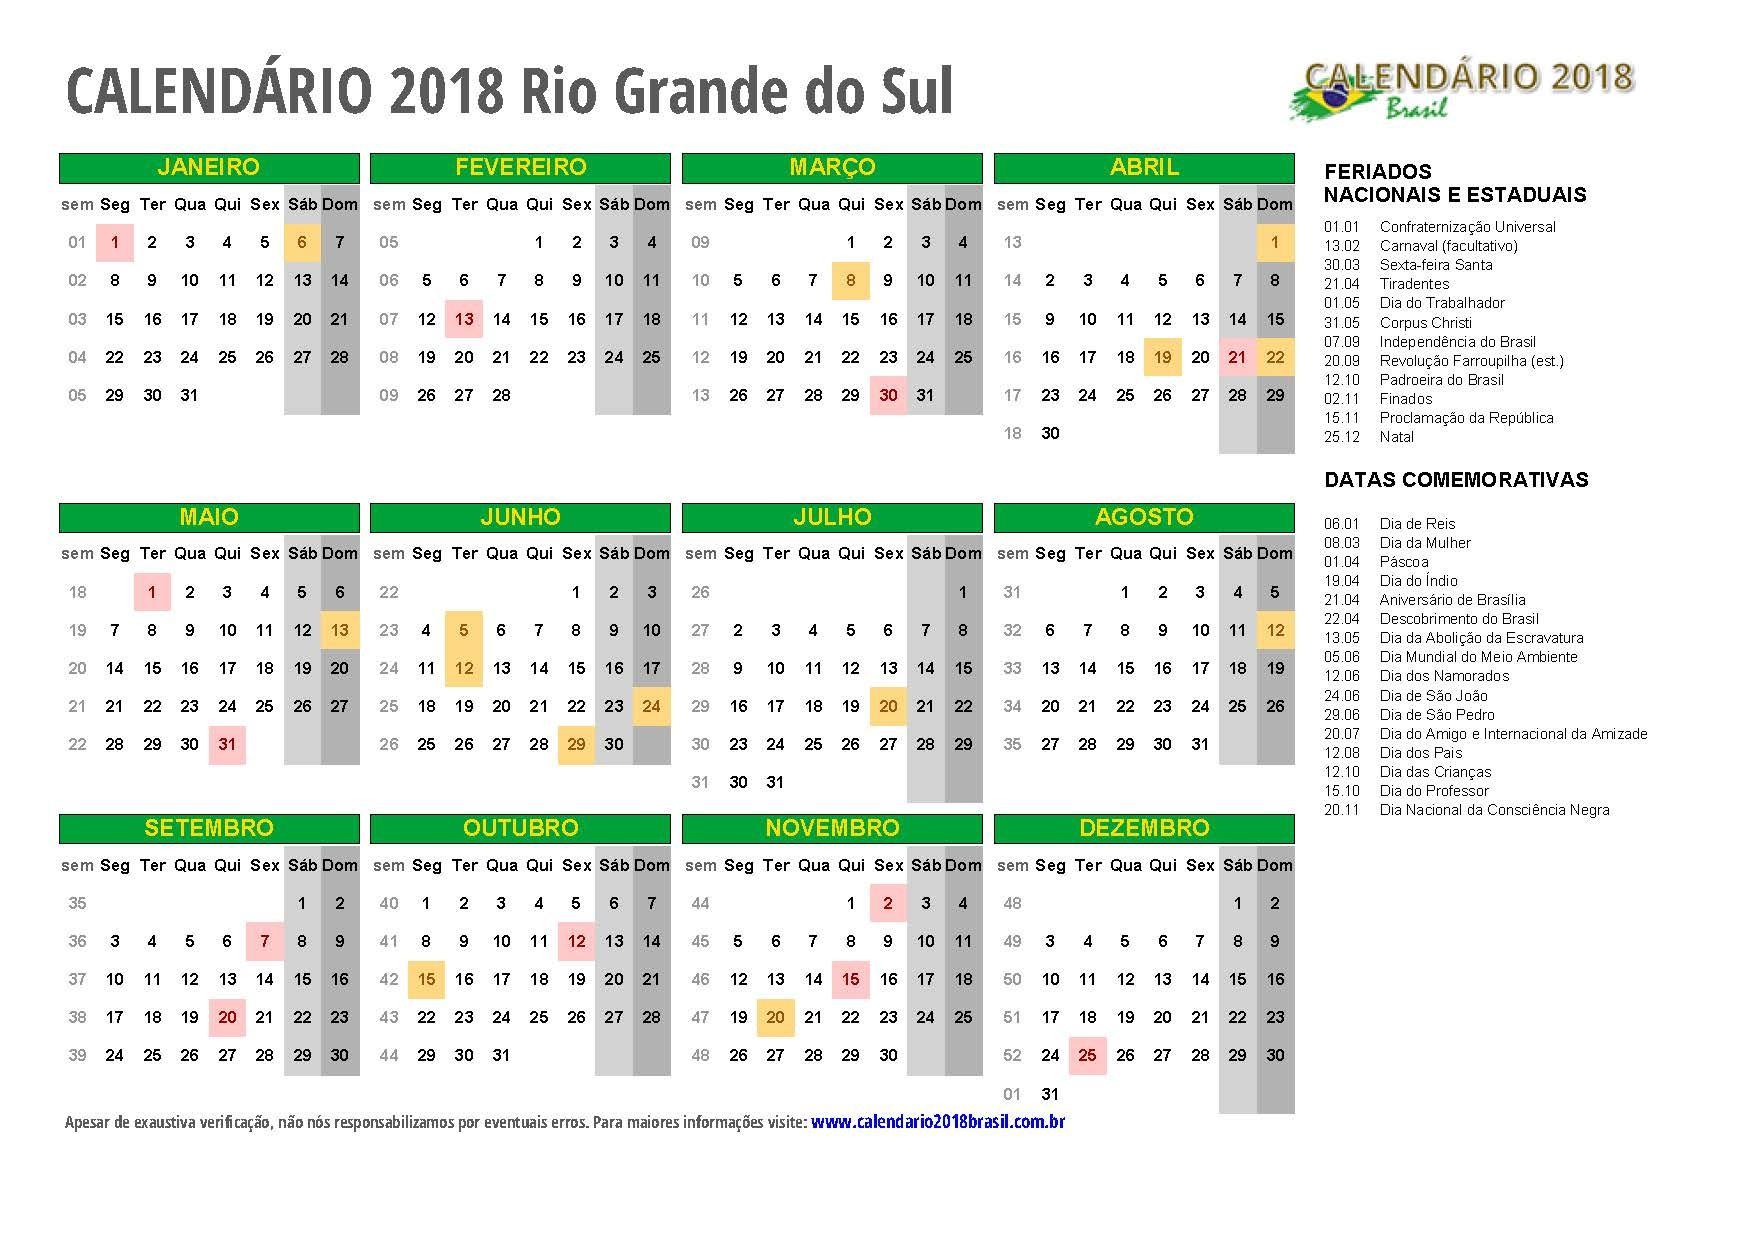 calendario 2018 Rio Grande do Sul m